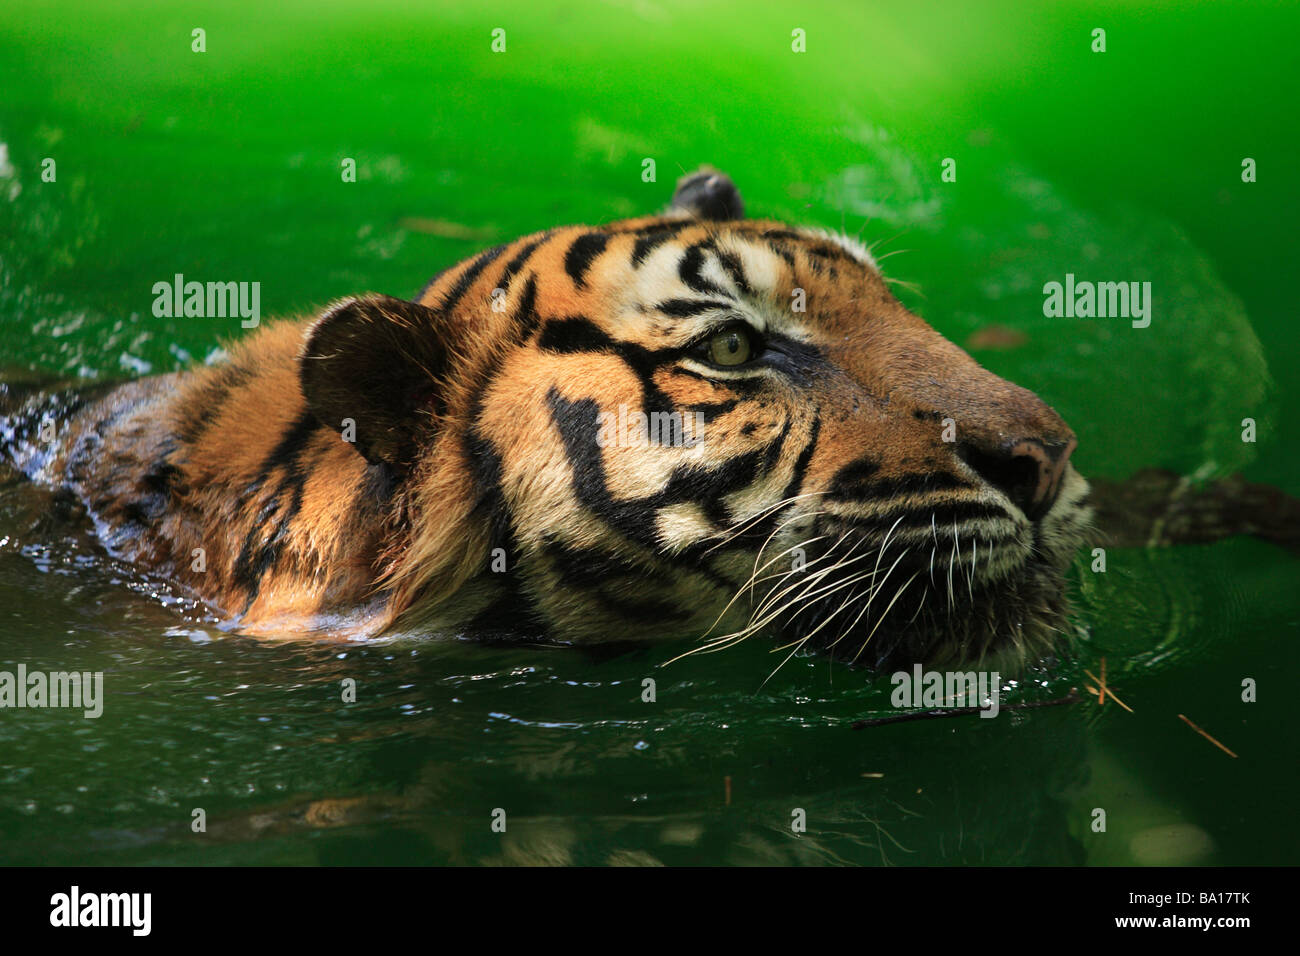 Tigre del Bengala Panthera tigris tigris nuotare nel lago Immagini Stock